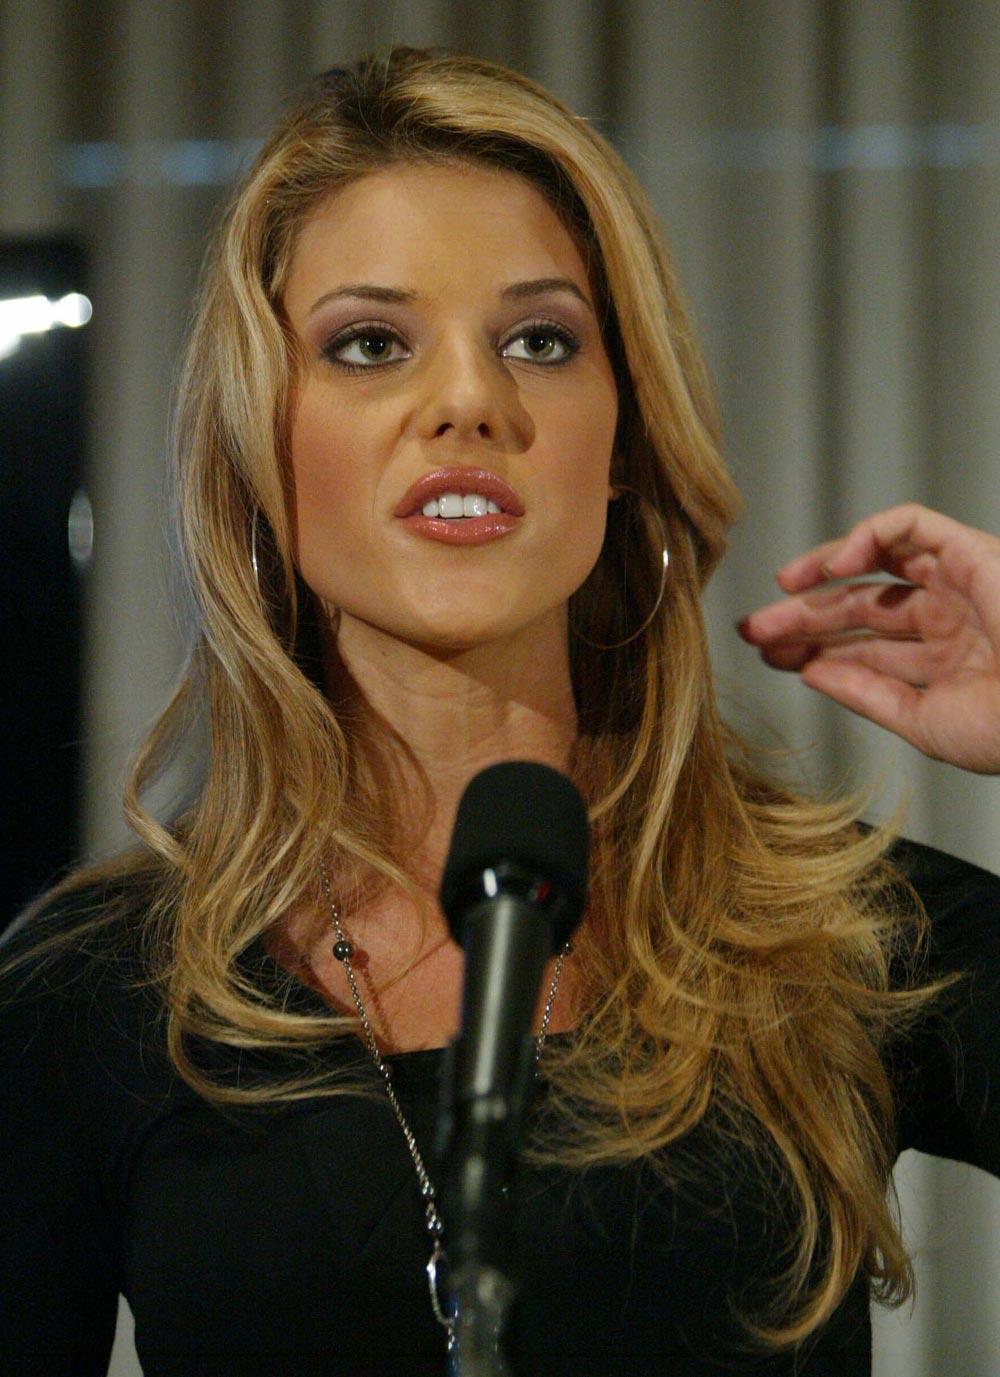 Carrie prejean sex tape online in Melbourne